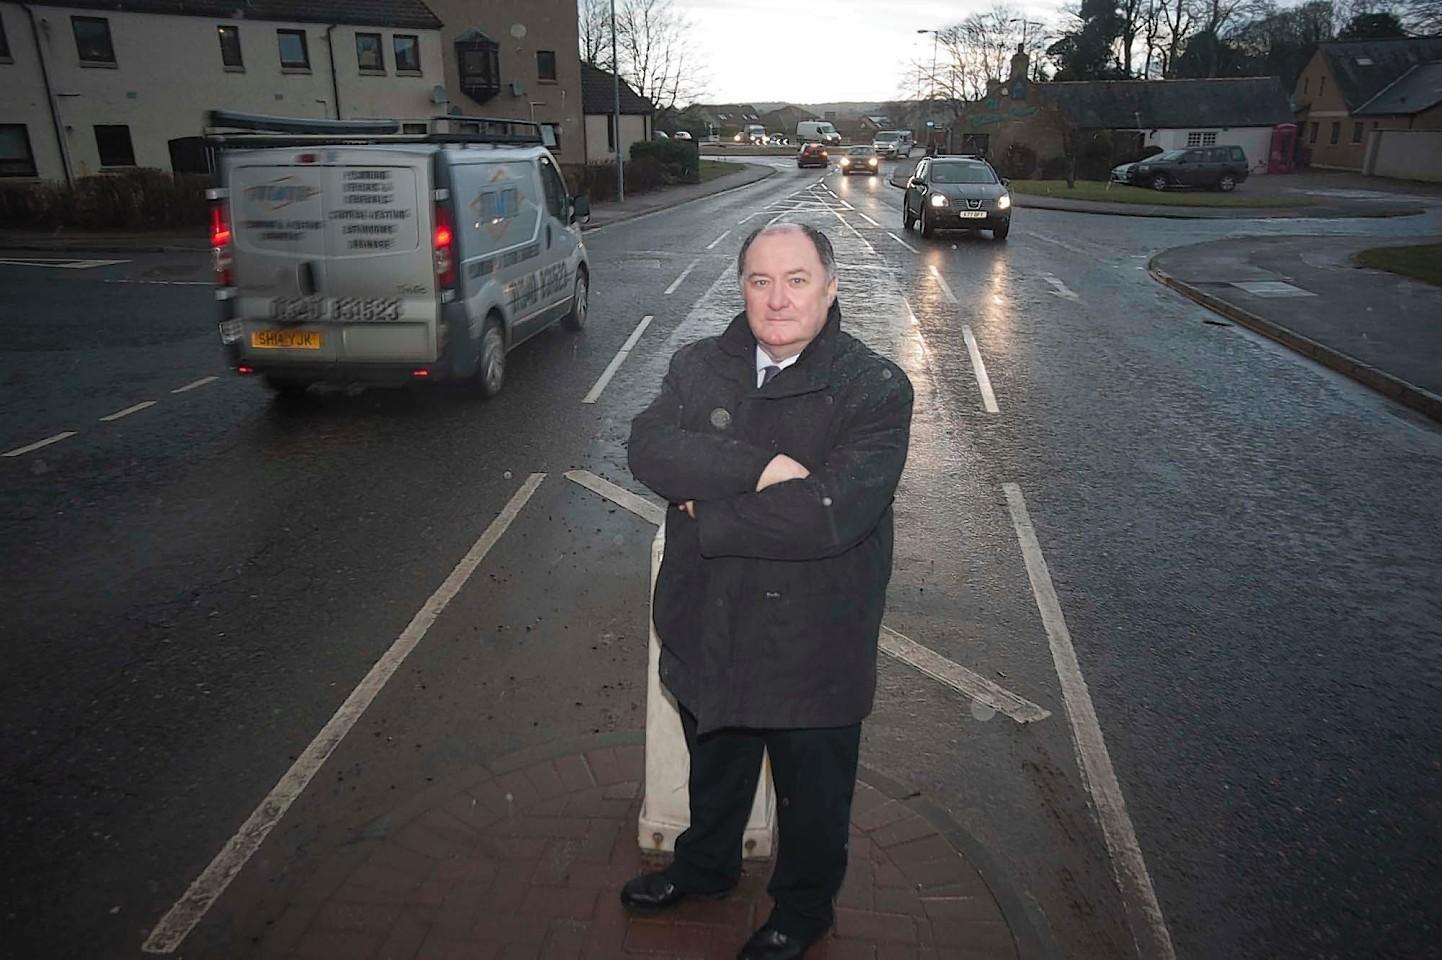 Councillor John Divers